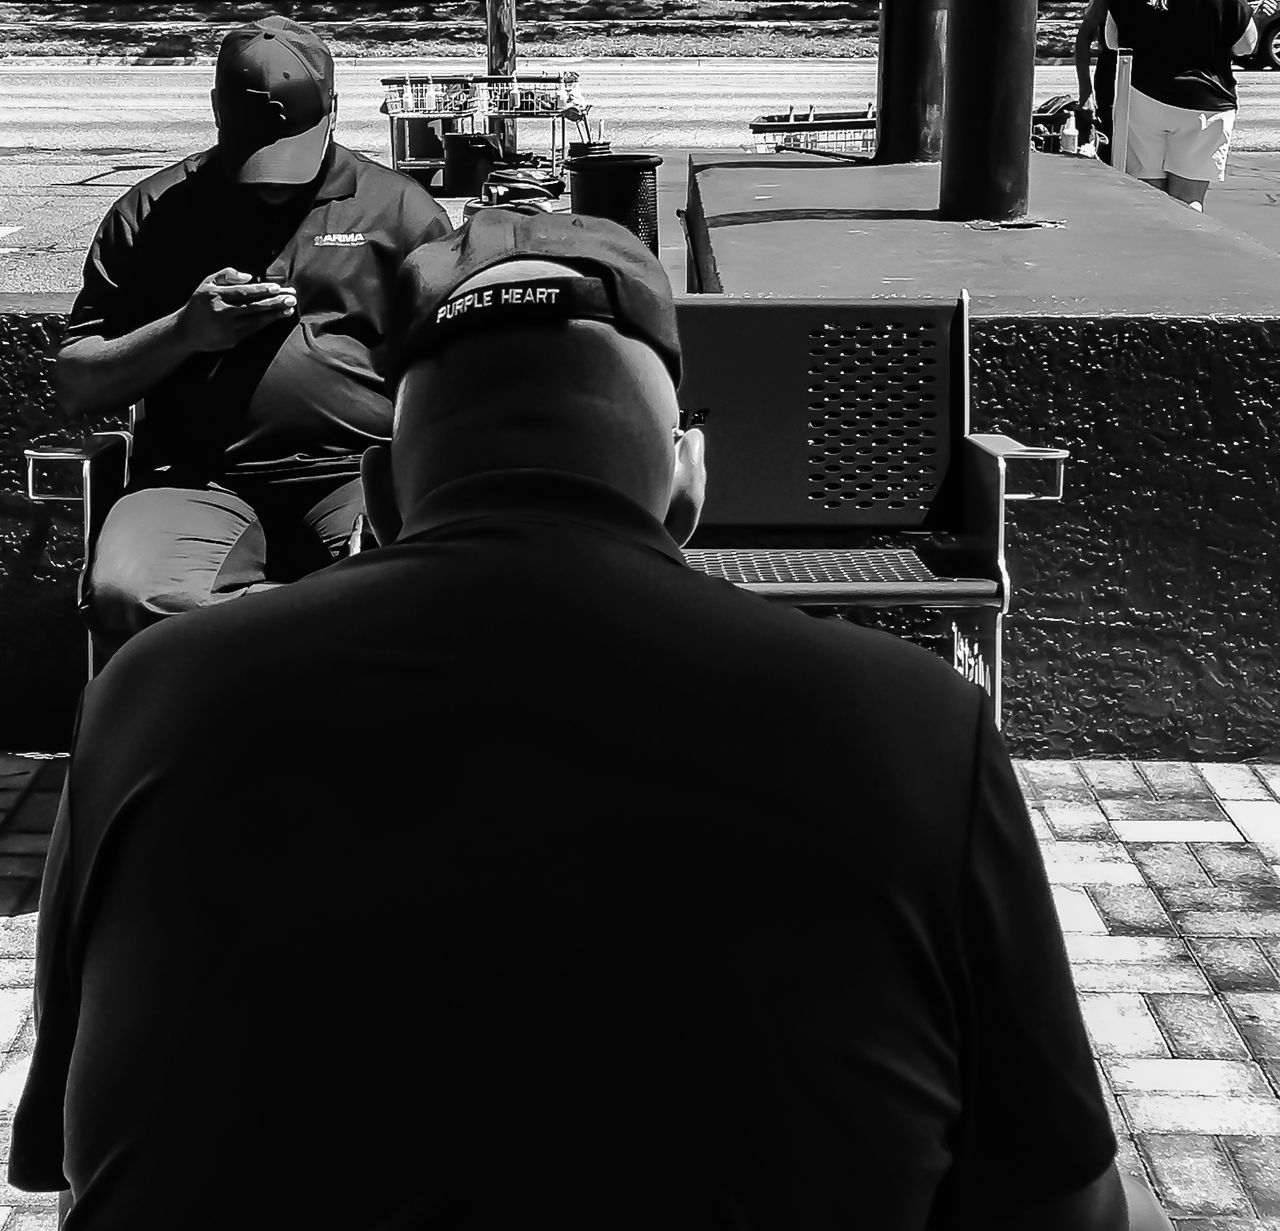 Black & White Black And White Blackandwhite Photography IPhone Photography IPhoneography Iphonephotography Real People Street Photography Streetphoto_bw Streetphotography